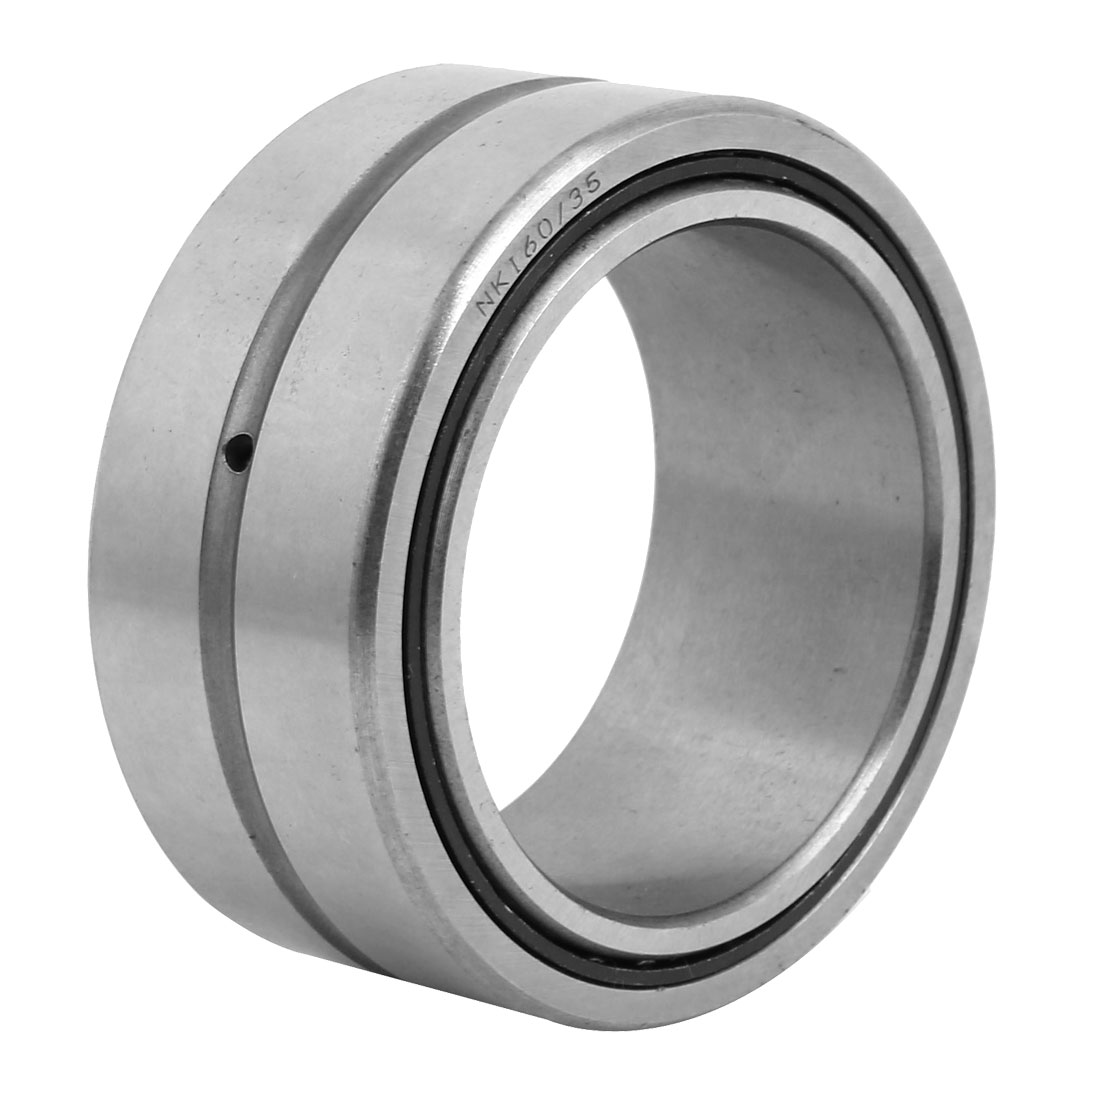 NKI60/35 60mmx82mmx35mm Inner Ring Needle Roller Bearing Silver Tone